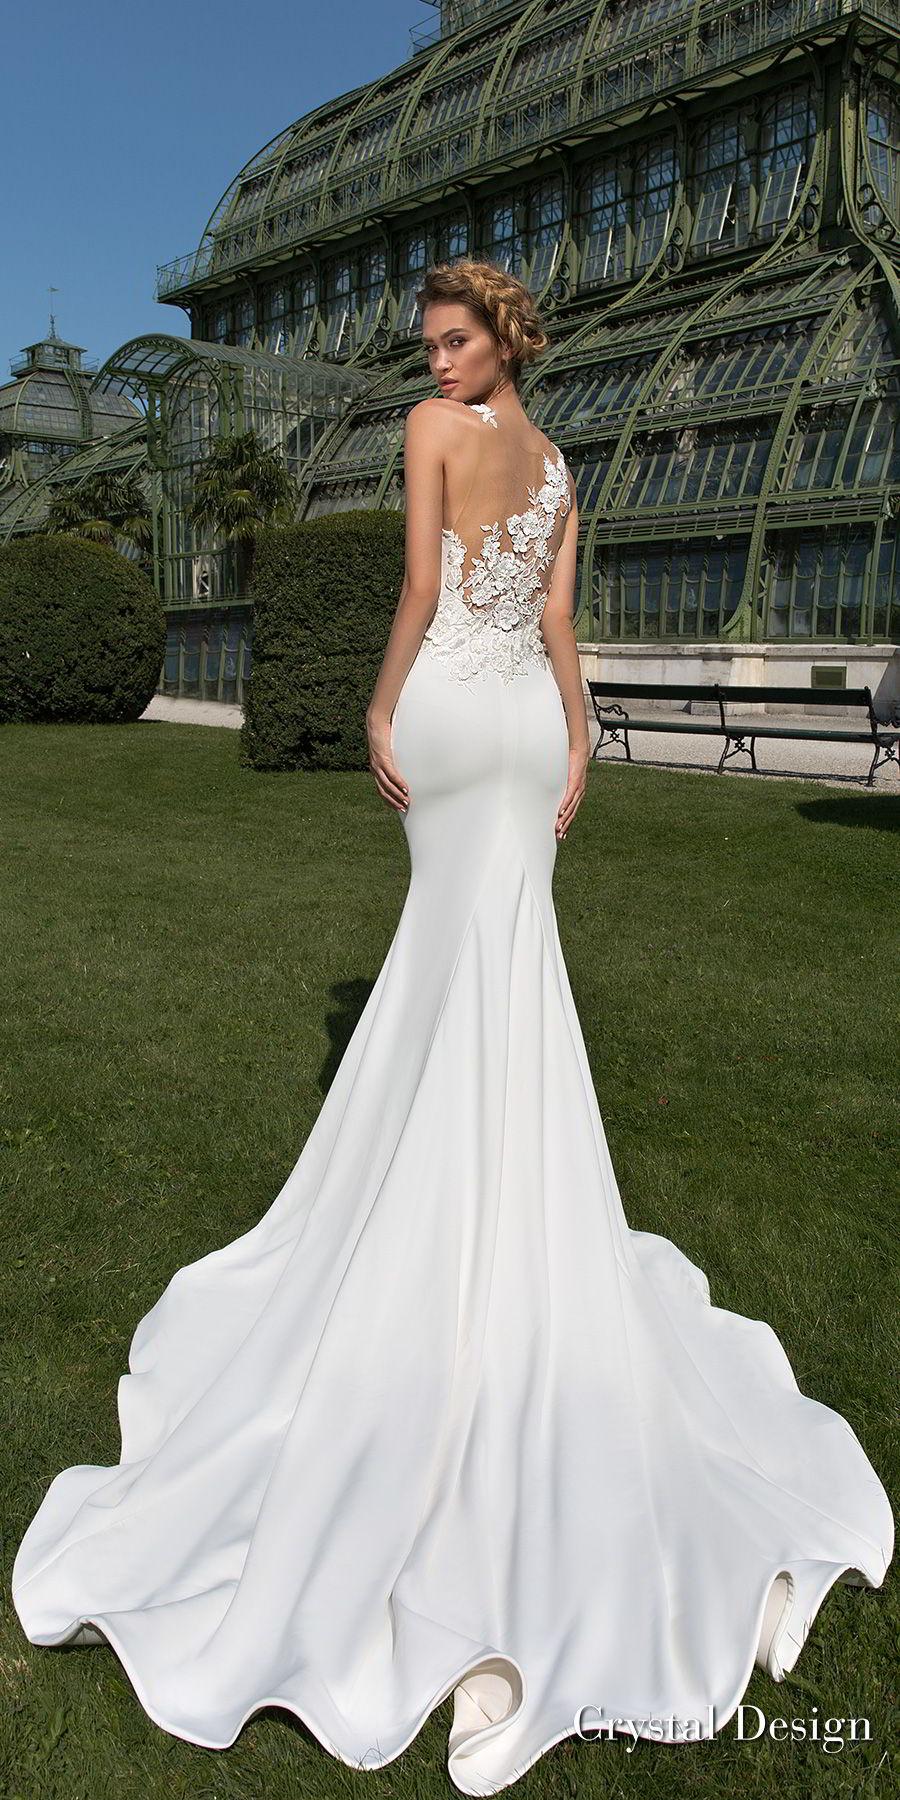 crystal design 2018 sleeveless halter neck simple clean elegant fit and flare wedding dress sheer lace back chapel train (keren) bv